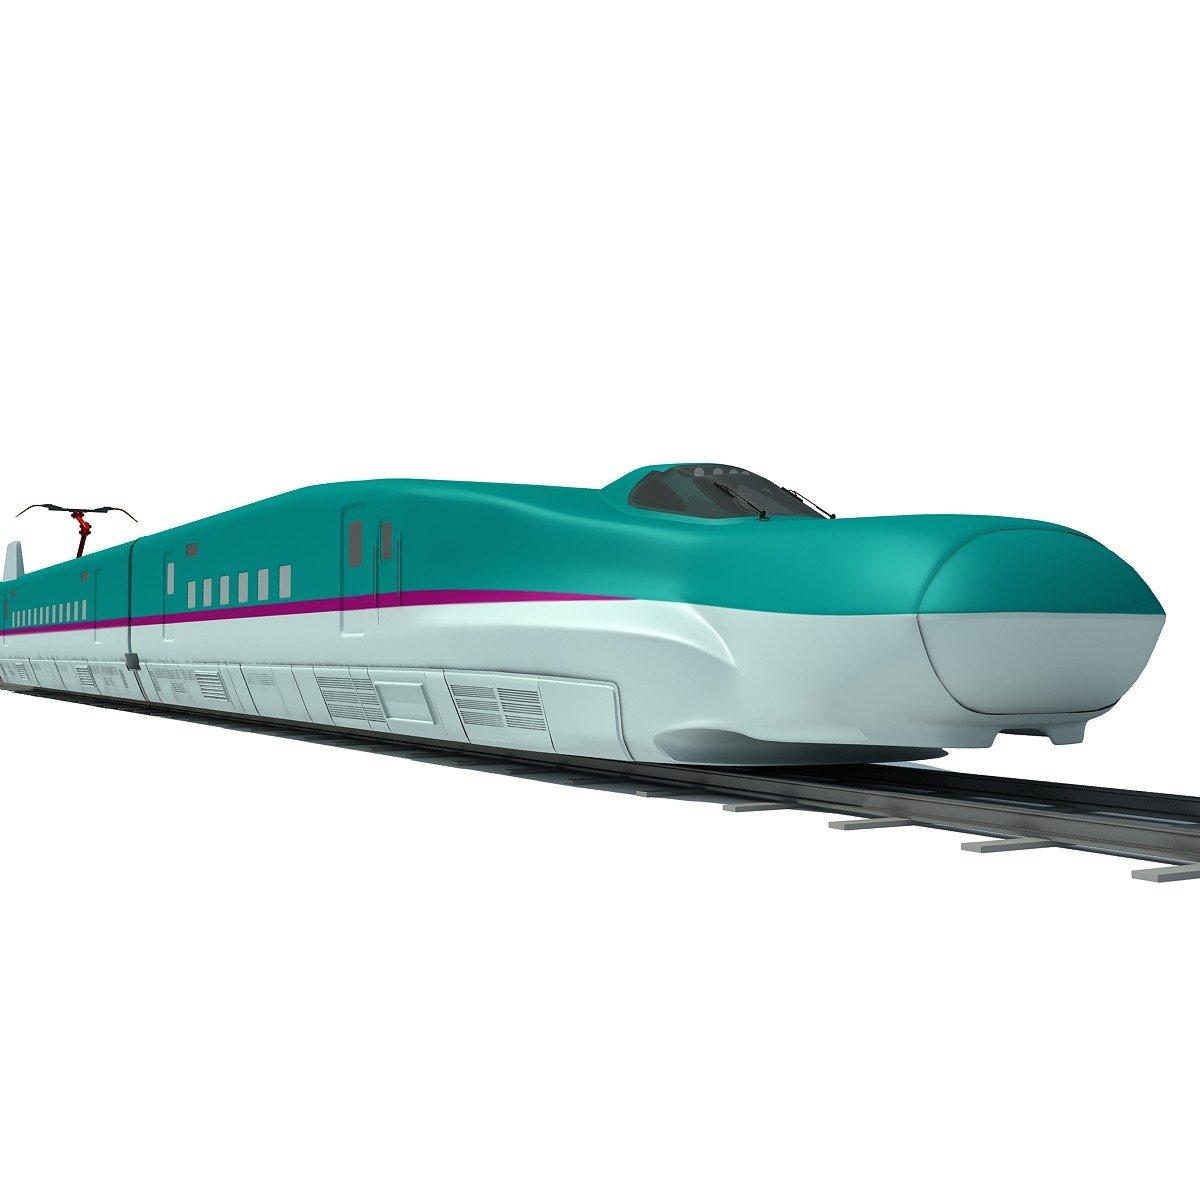 High Speed Train 3D Model #High #Speed #Train # #3d #3dmodels #3dmodel #3ddesign #3dgraphics #3dsmax #3dhorse